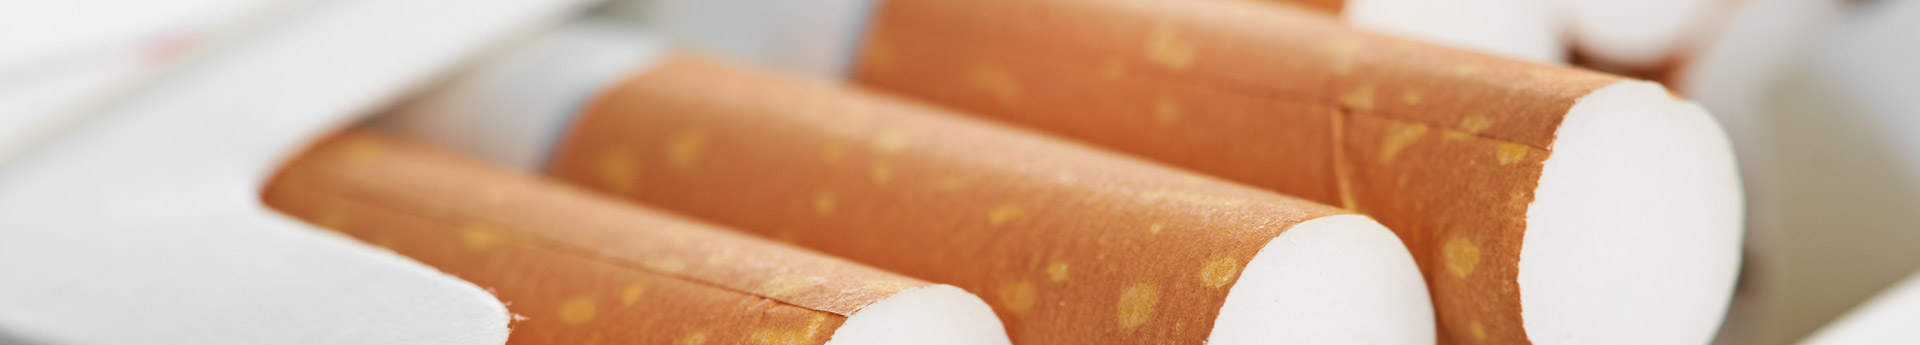 zigaretten_slider1